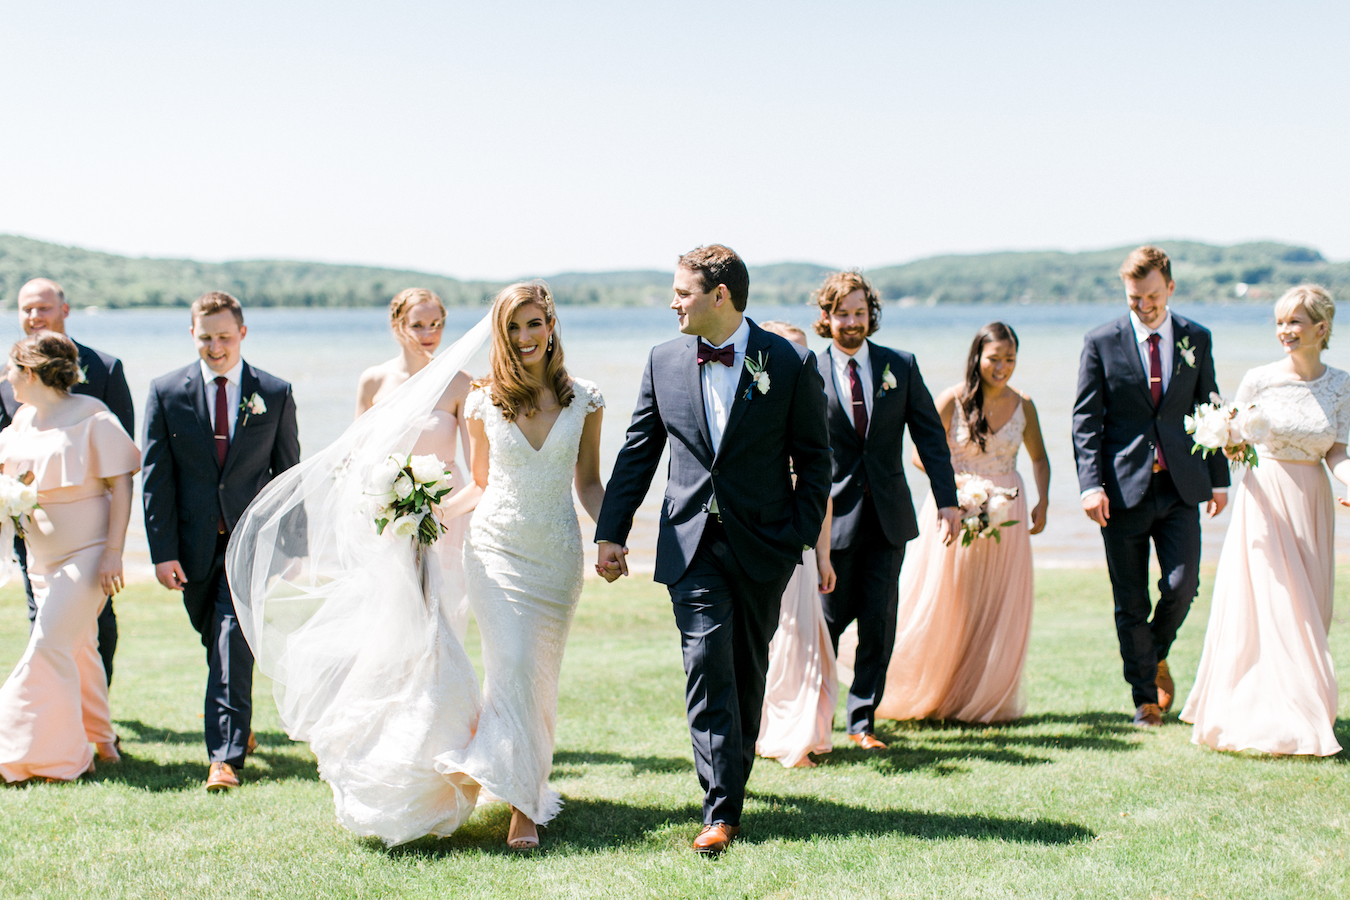 A wedding party smiling at Deer Lake, Michigan